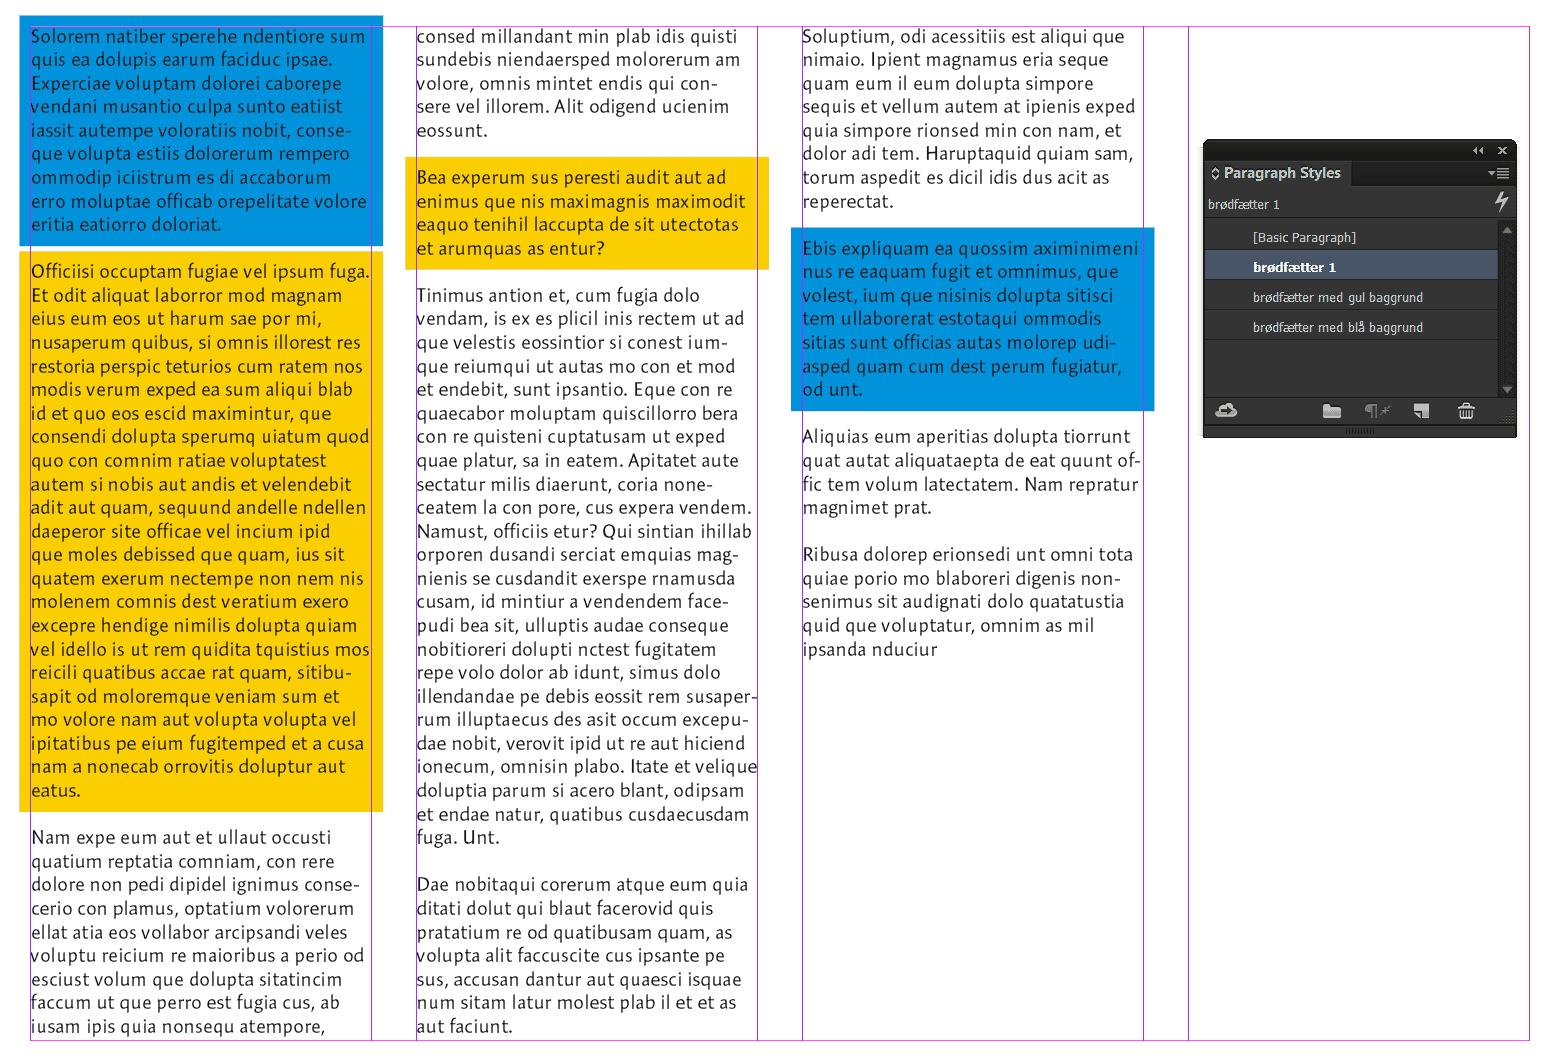 indesign-kursus-tip-paragraph-shading-udseende